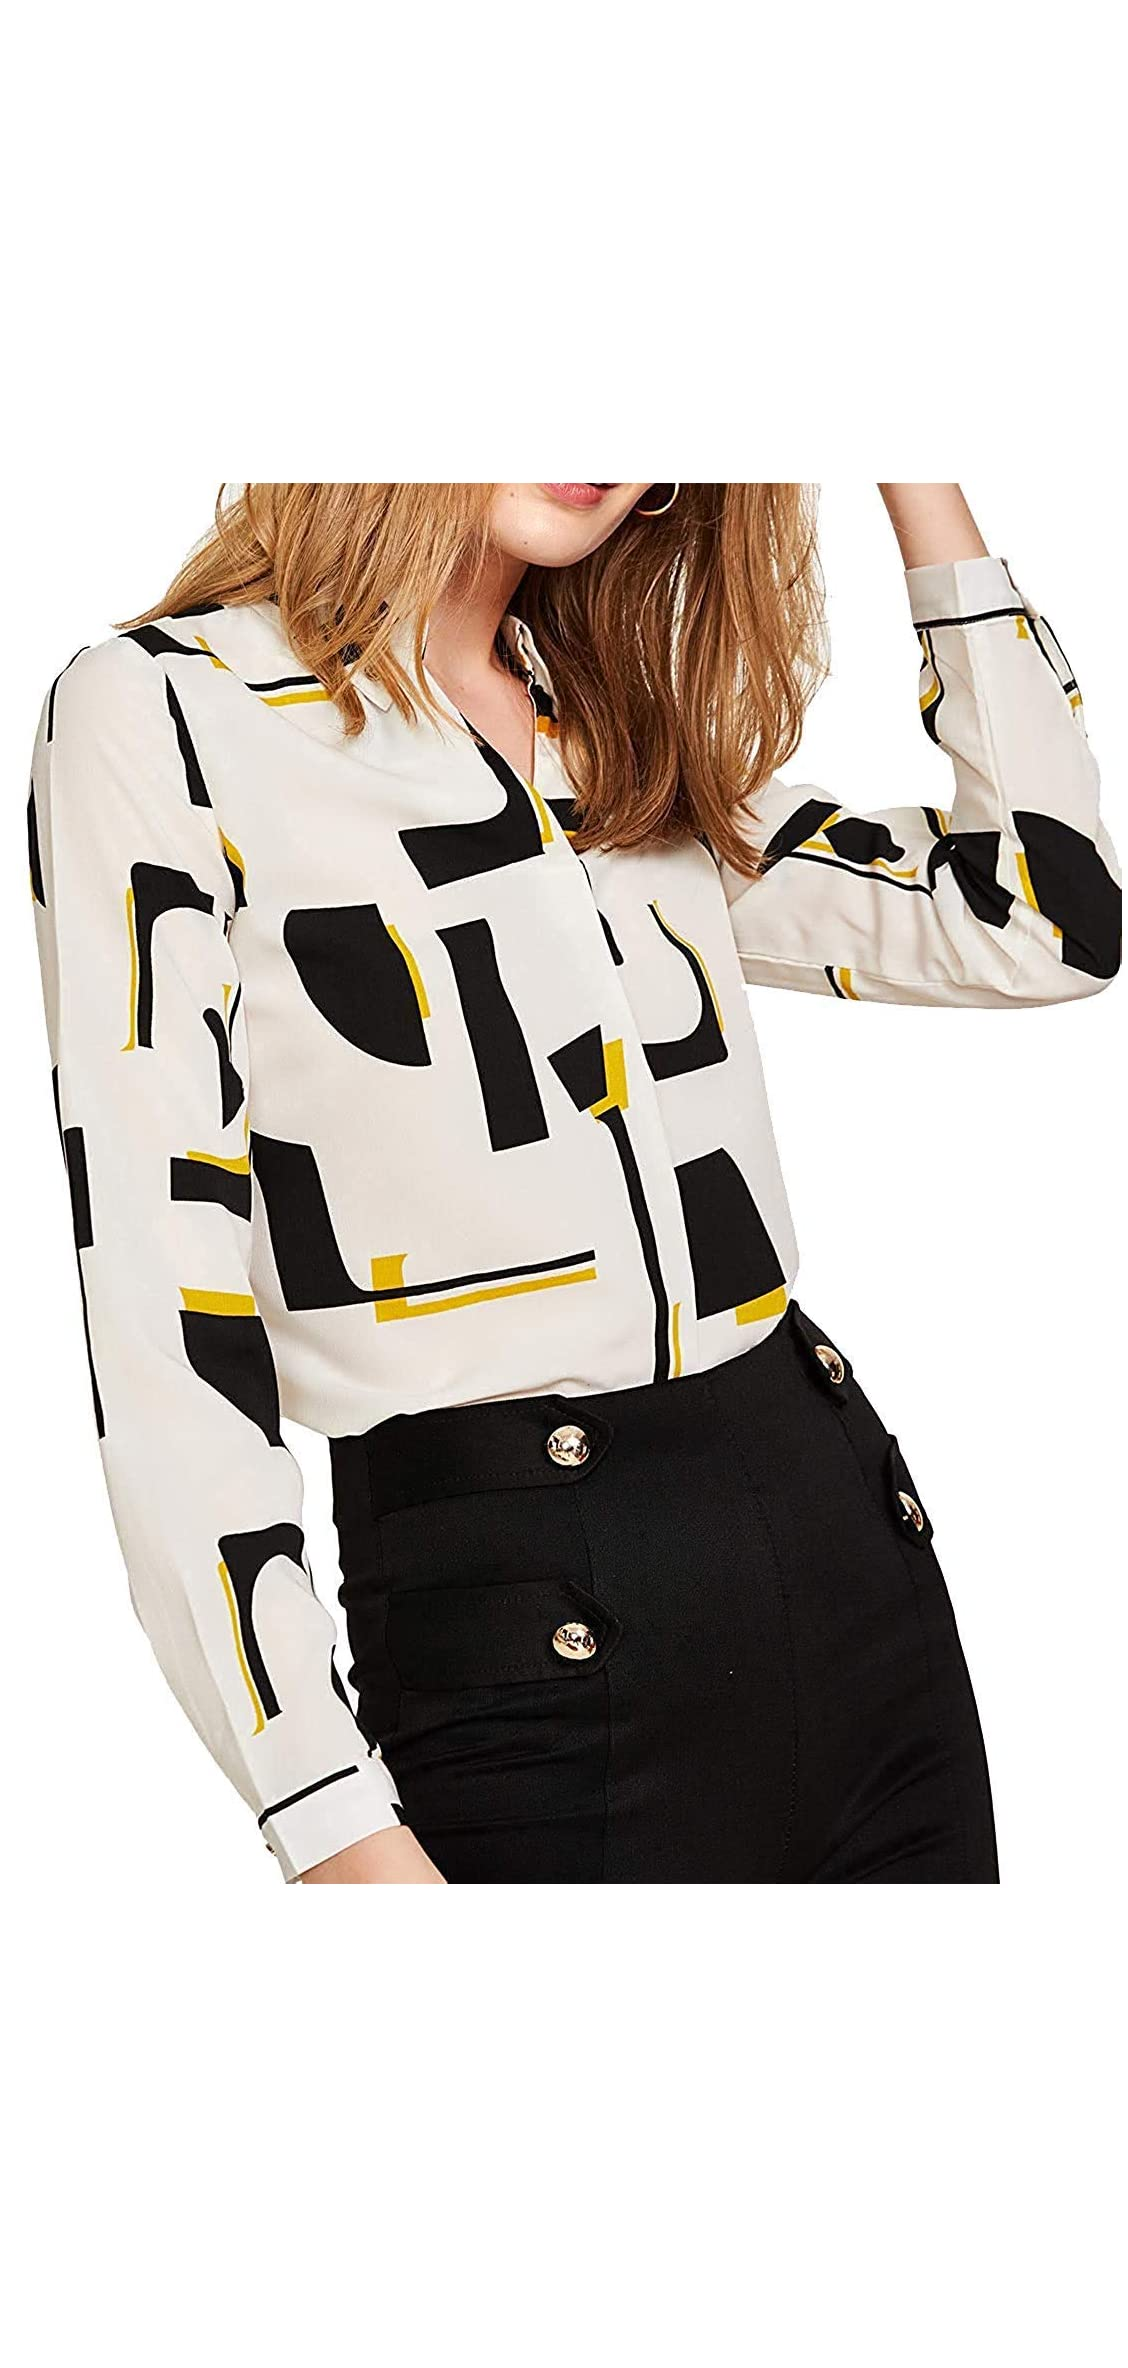 Women's Elegant Button Workwear Shirt Stand Collar Long